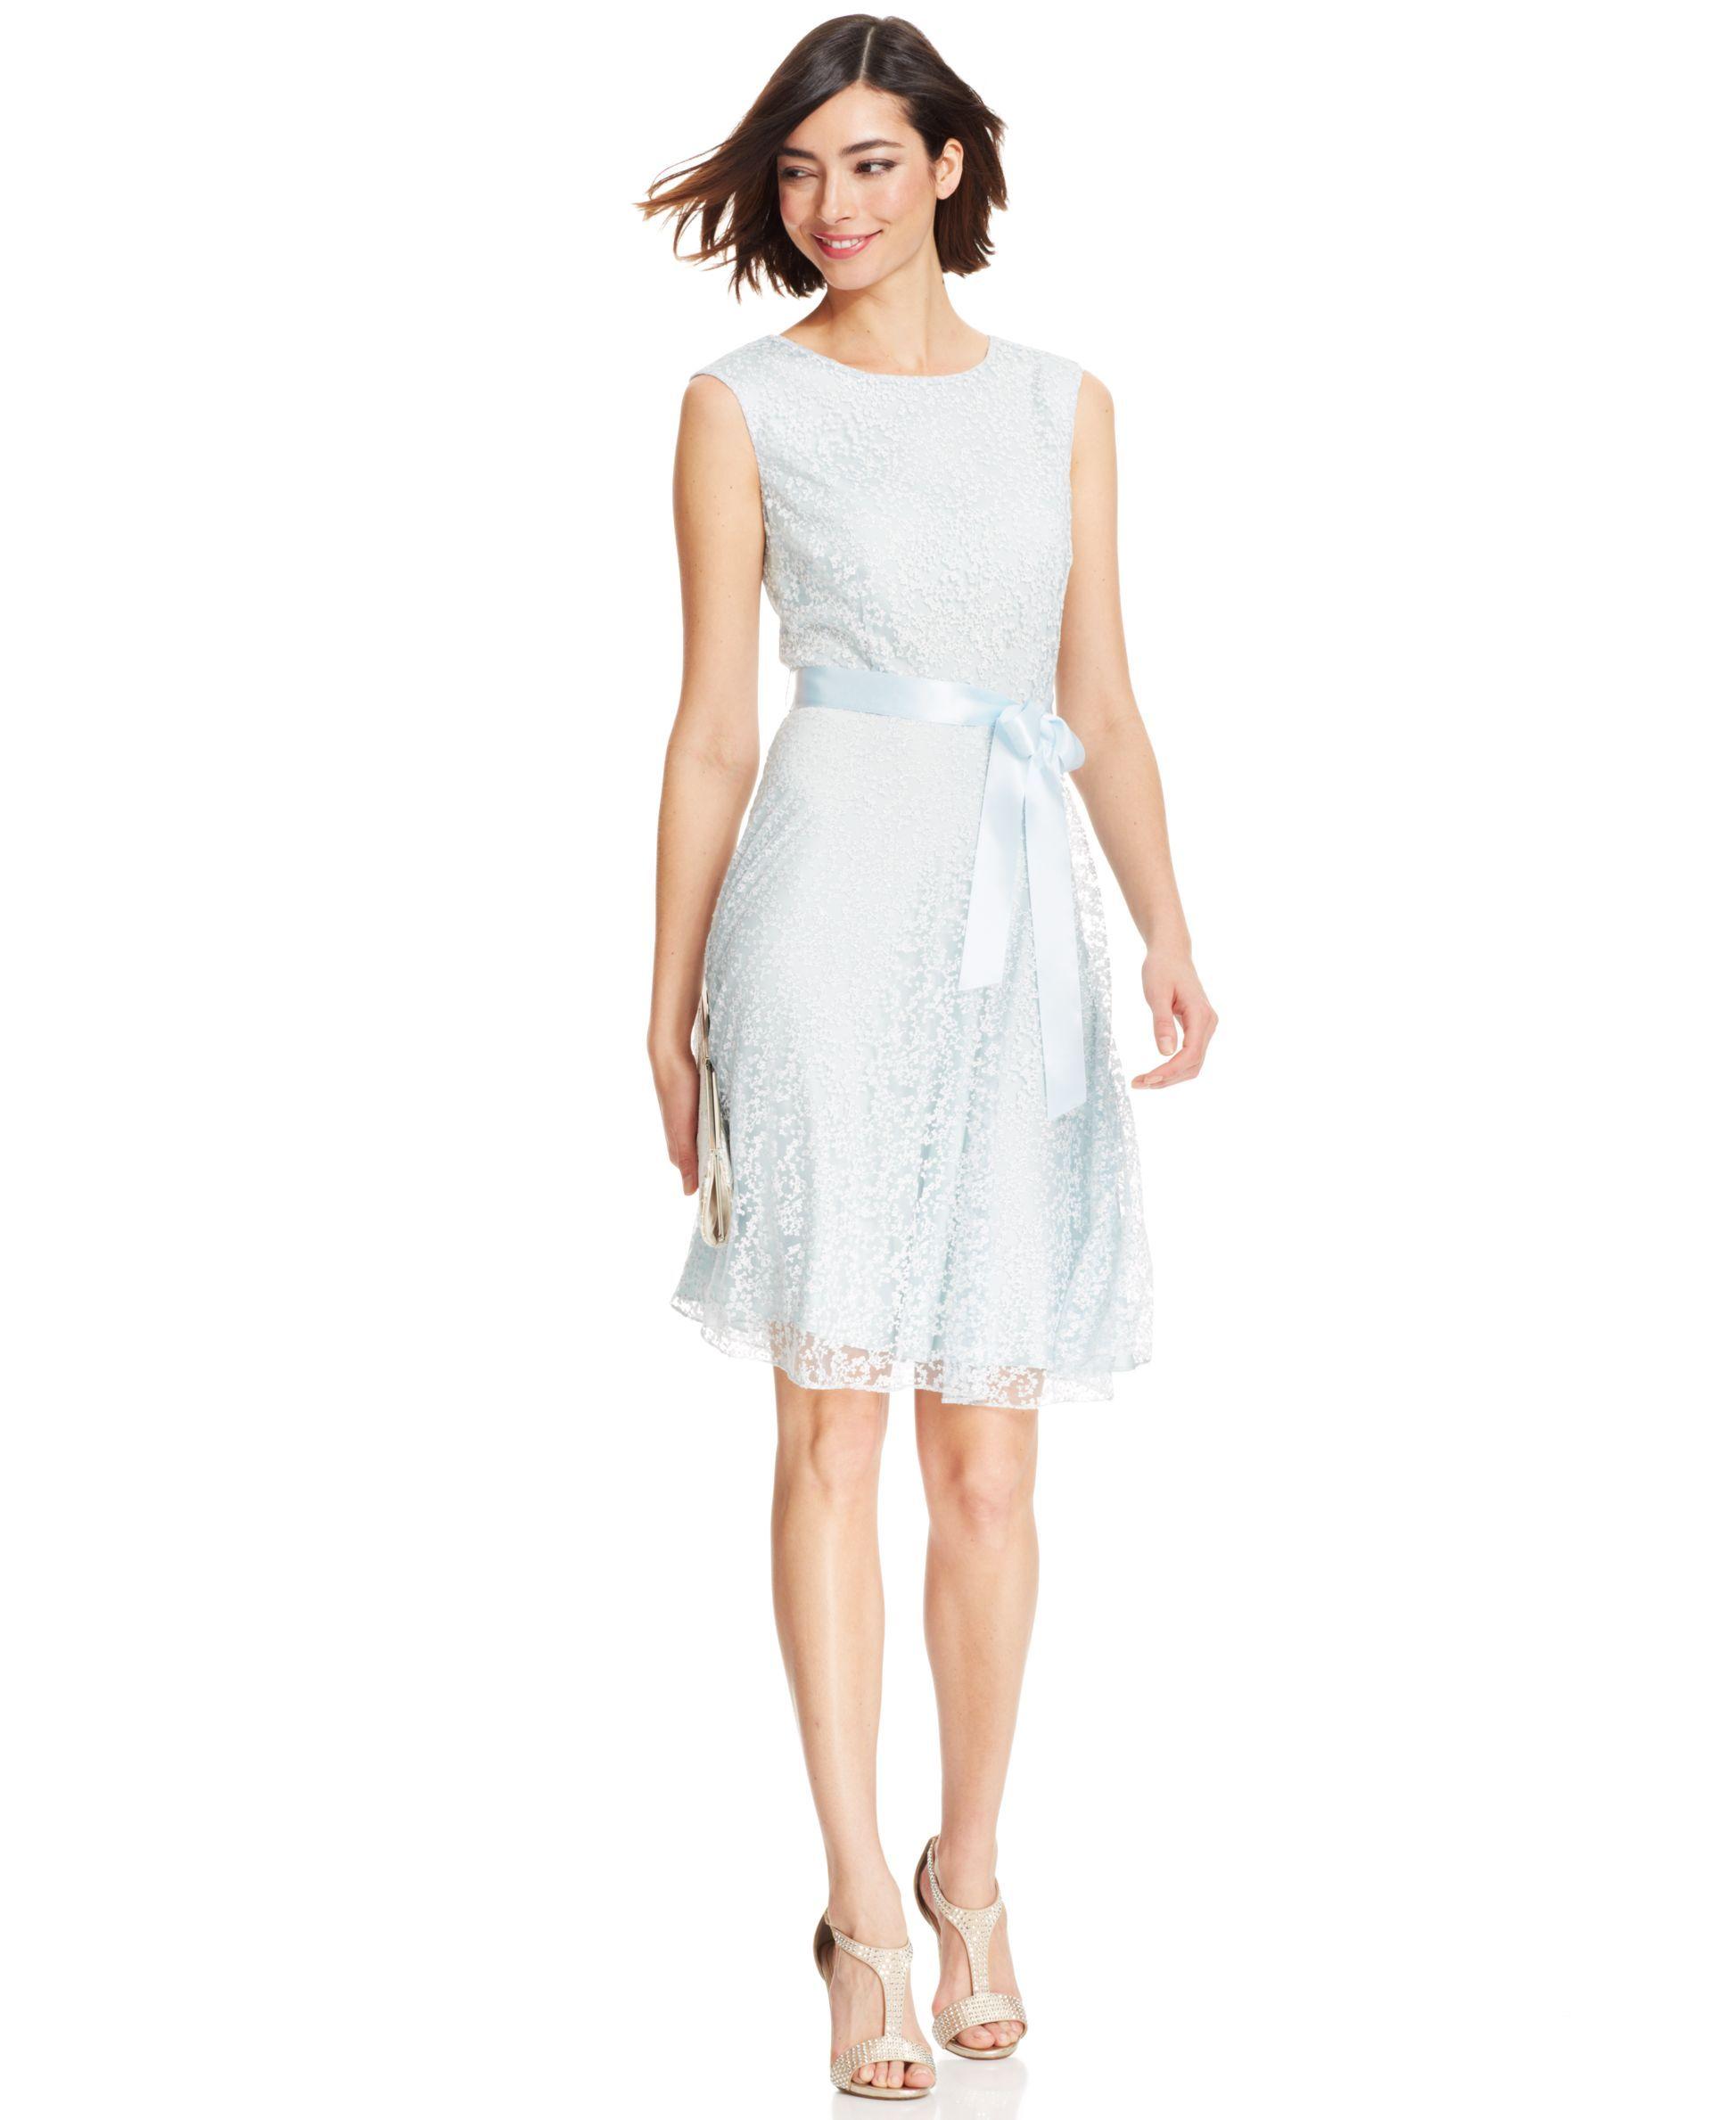 2109604c6e21 Tahari Lace Dress Lord And Taylor - raveitsafe